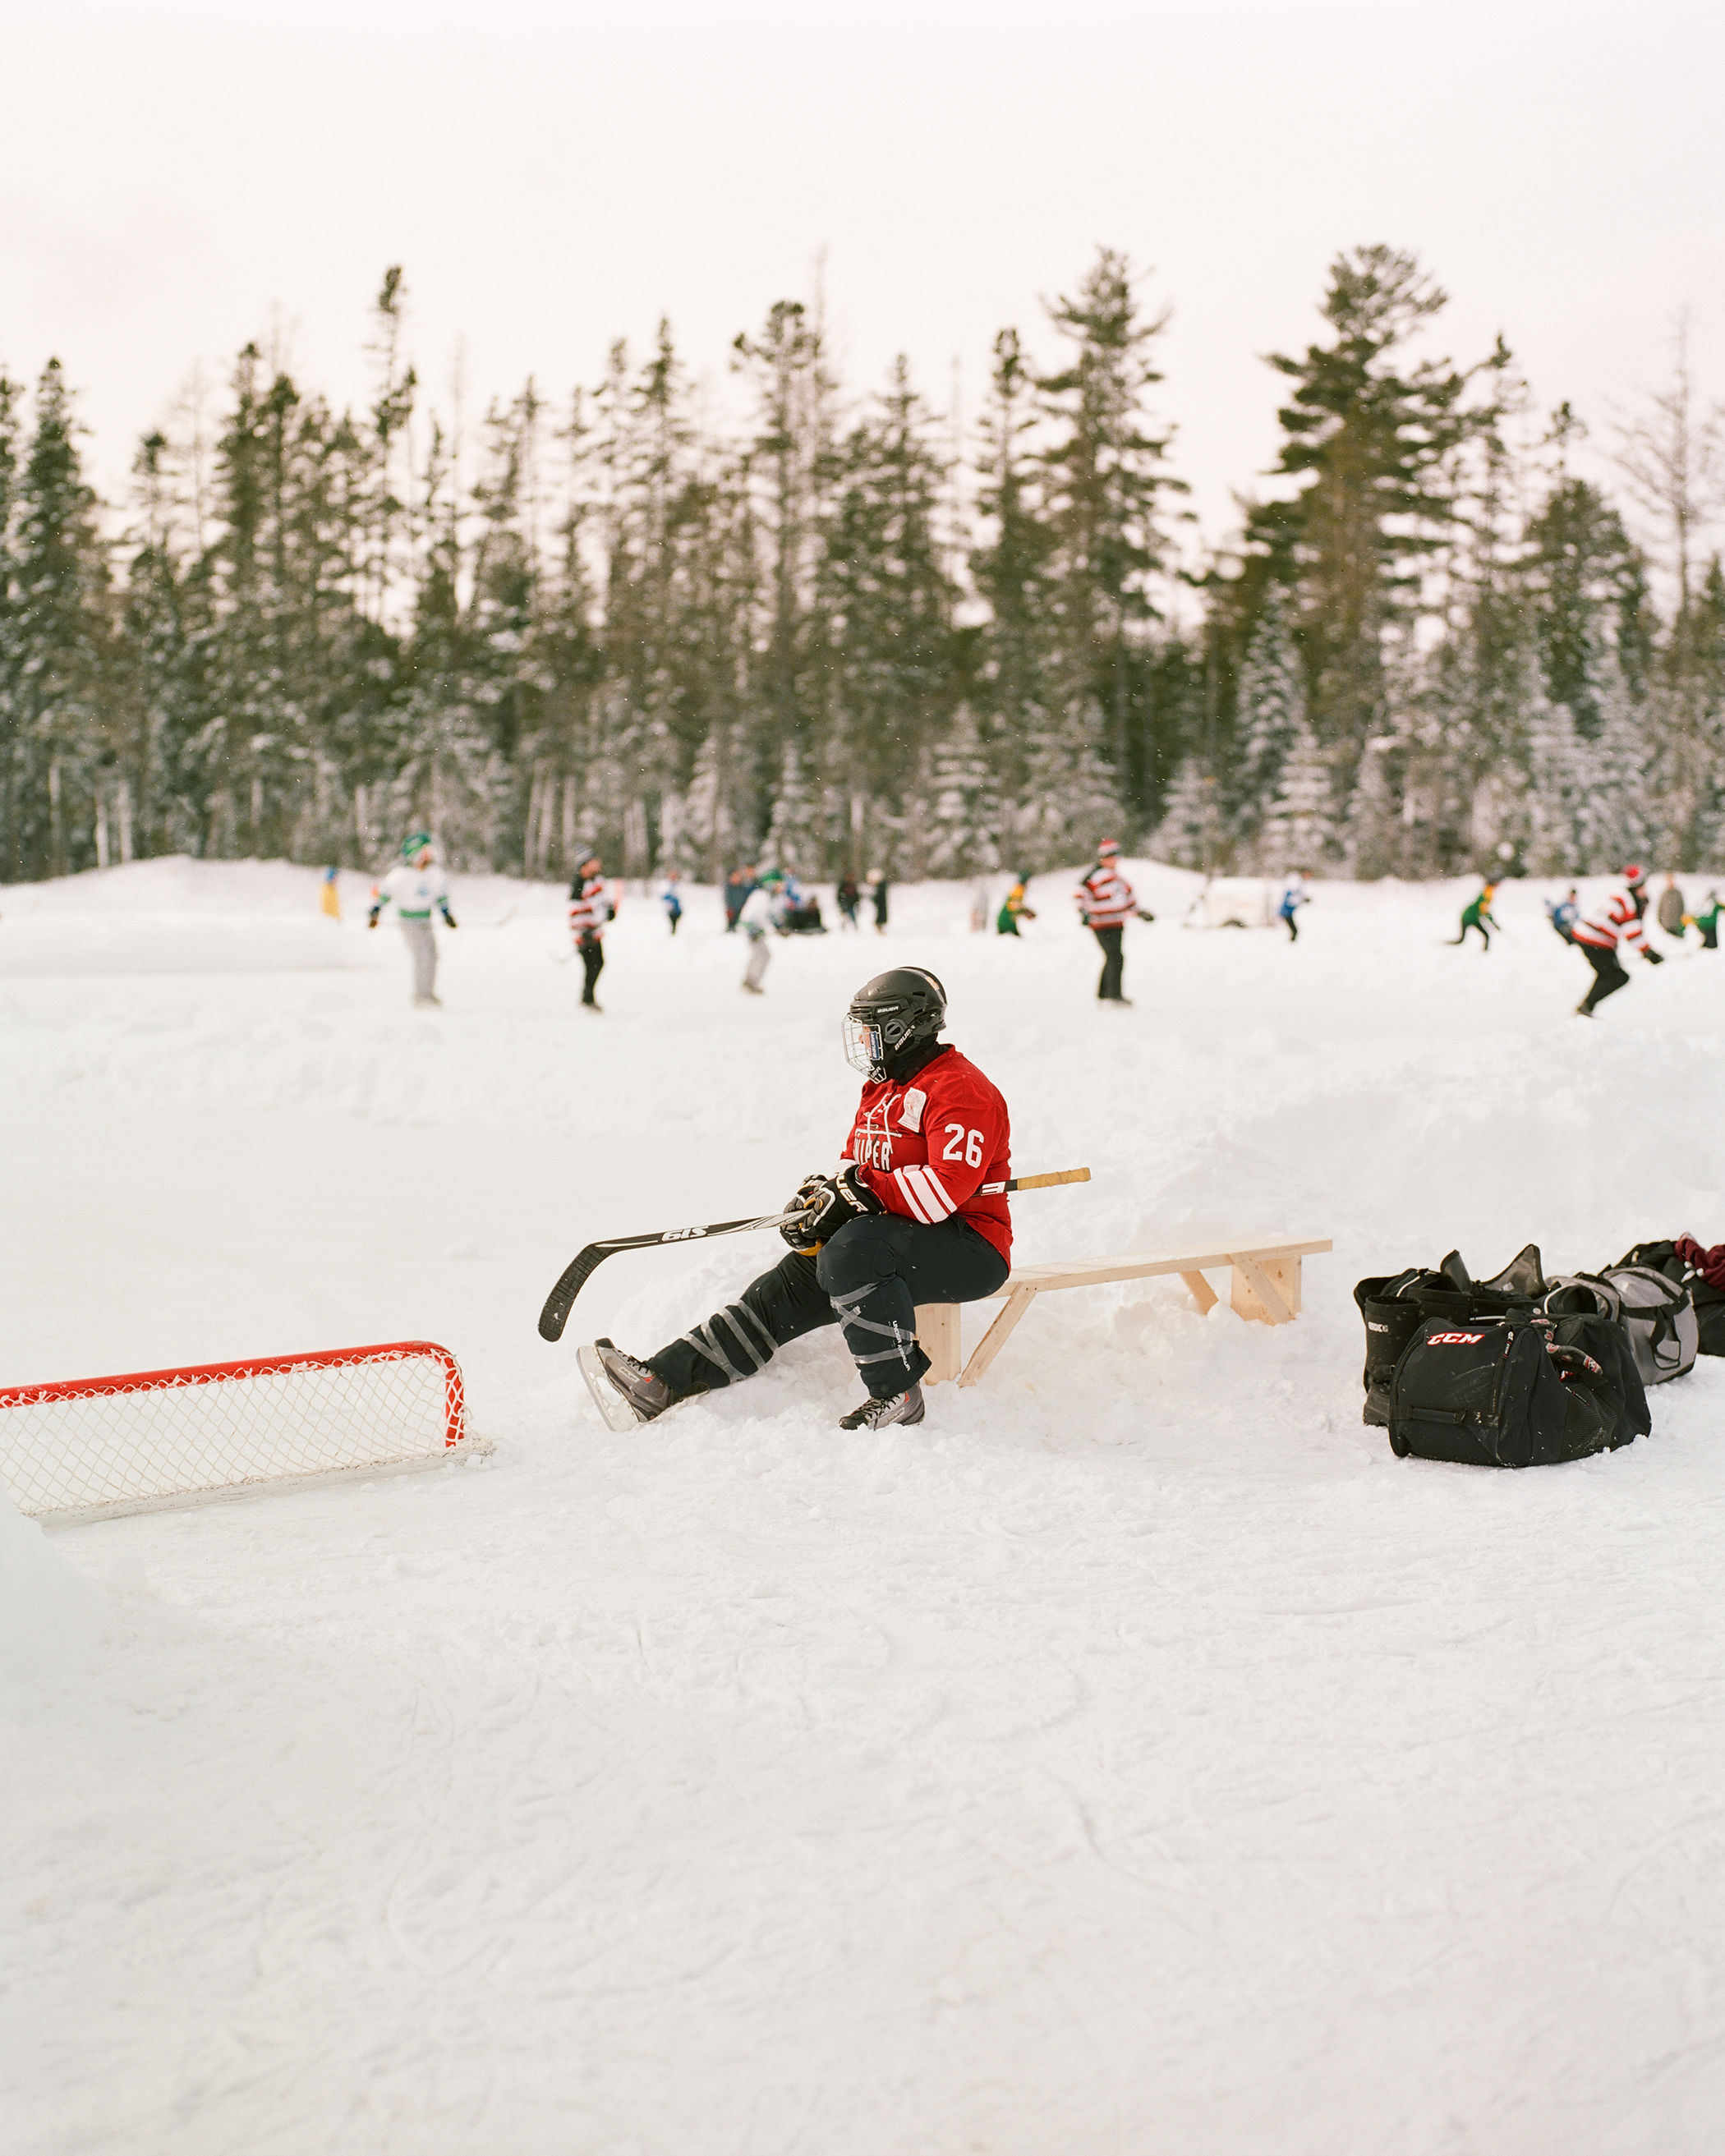 205.EnRoute-PondHockeyFilm_663.jpg